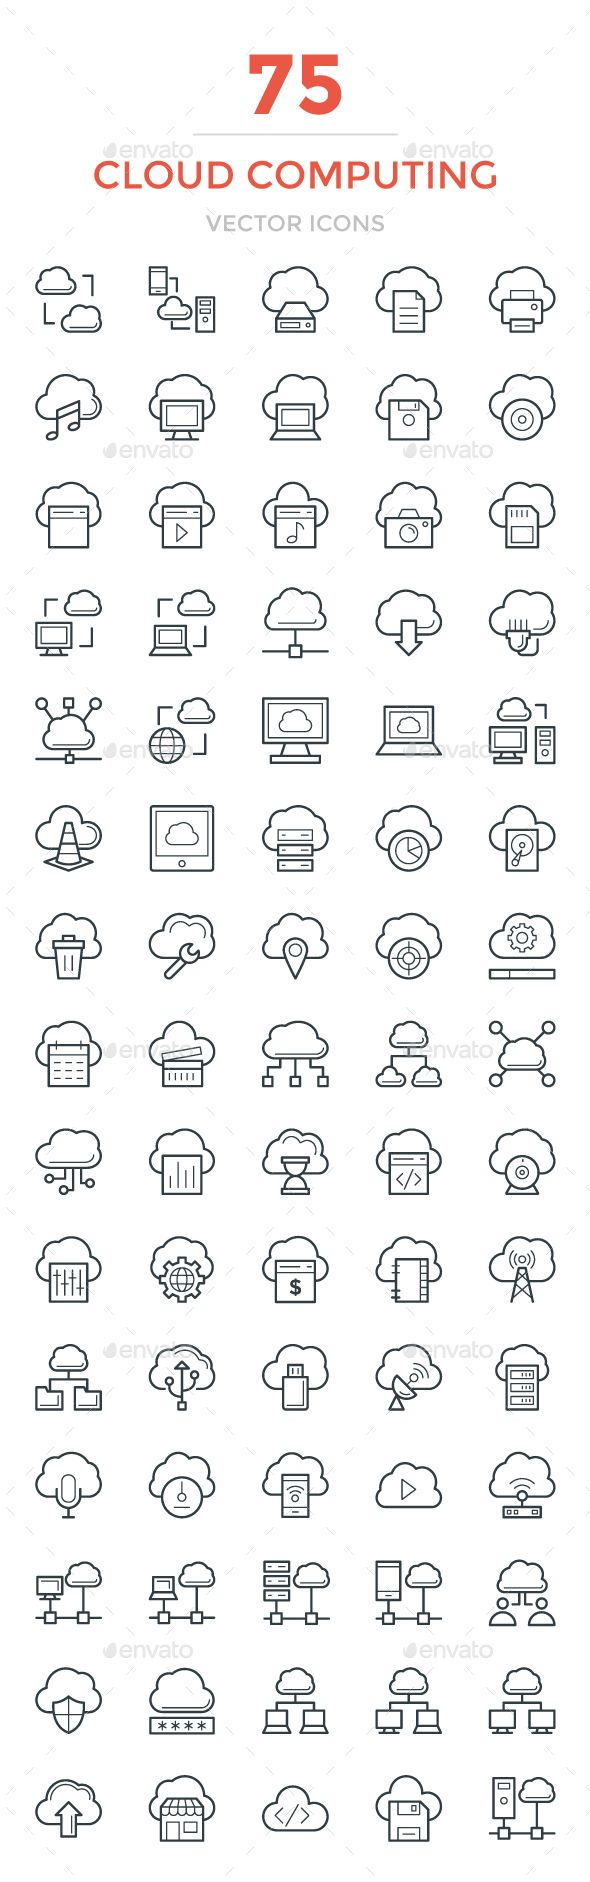 75 Cloud Computing Vector Icons. Download here: https://graphicriver.net/item/75-cloud-computing-vector-icons/17045594?ref=ksioks